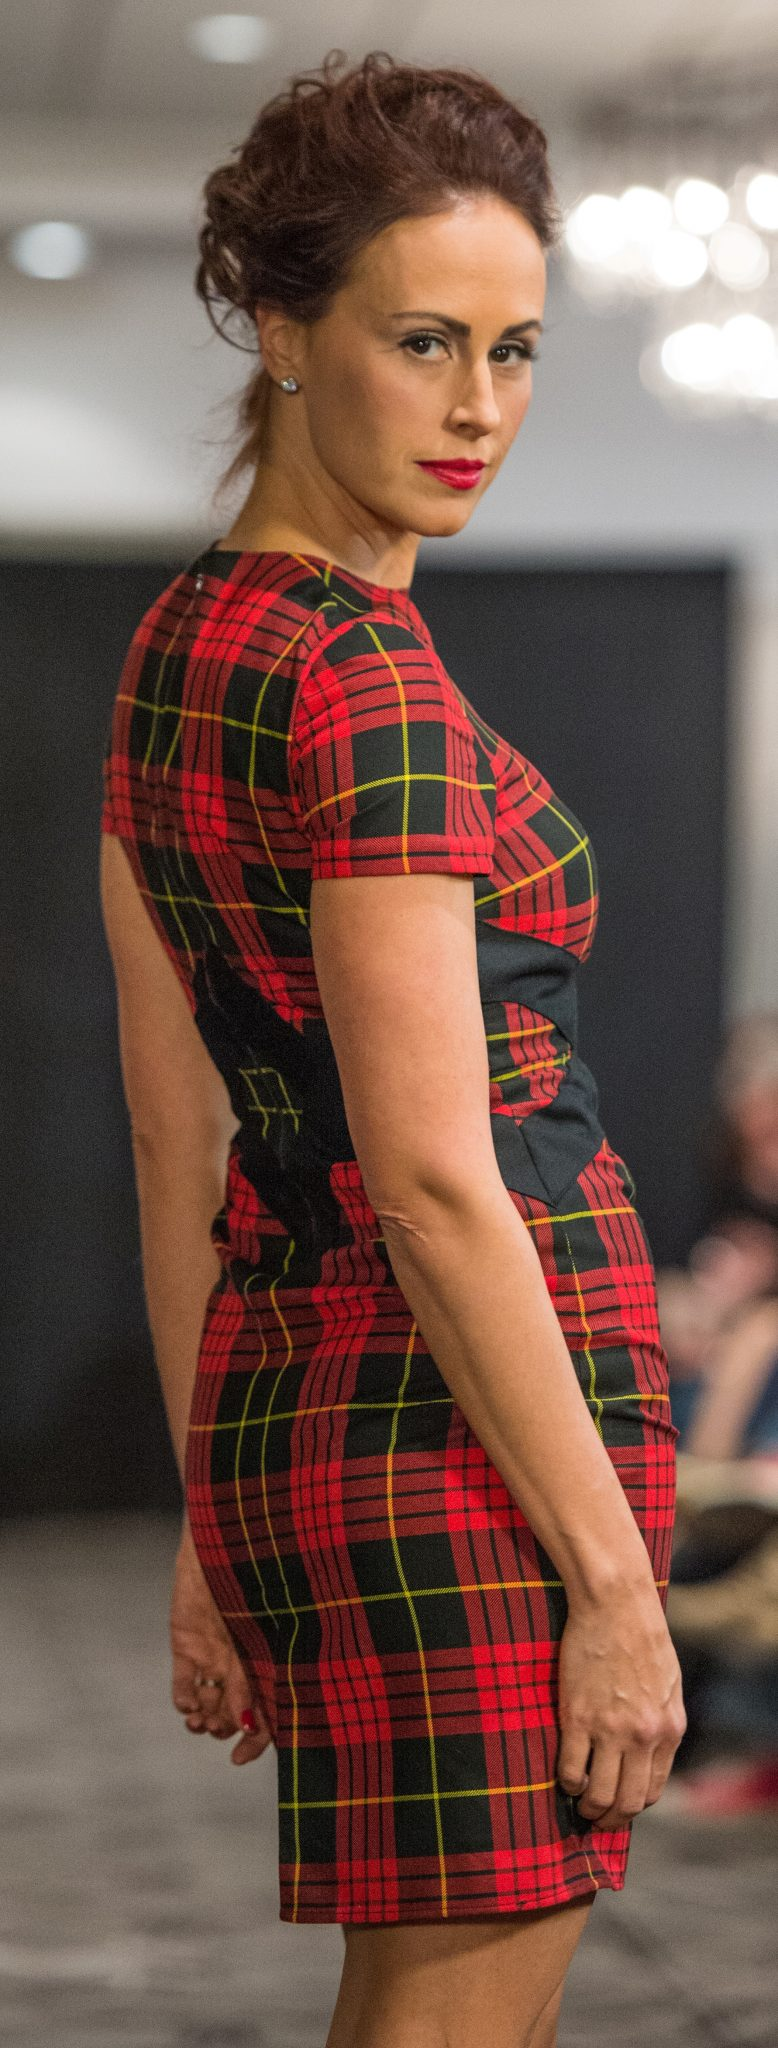 Veronica MacIsaac Prince George 2014-0705